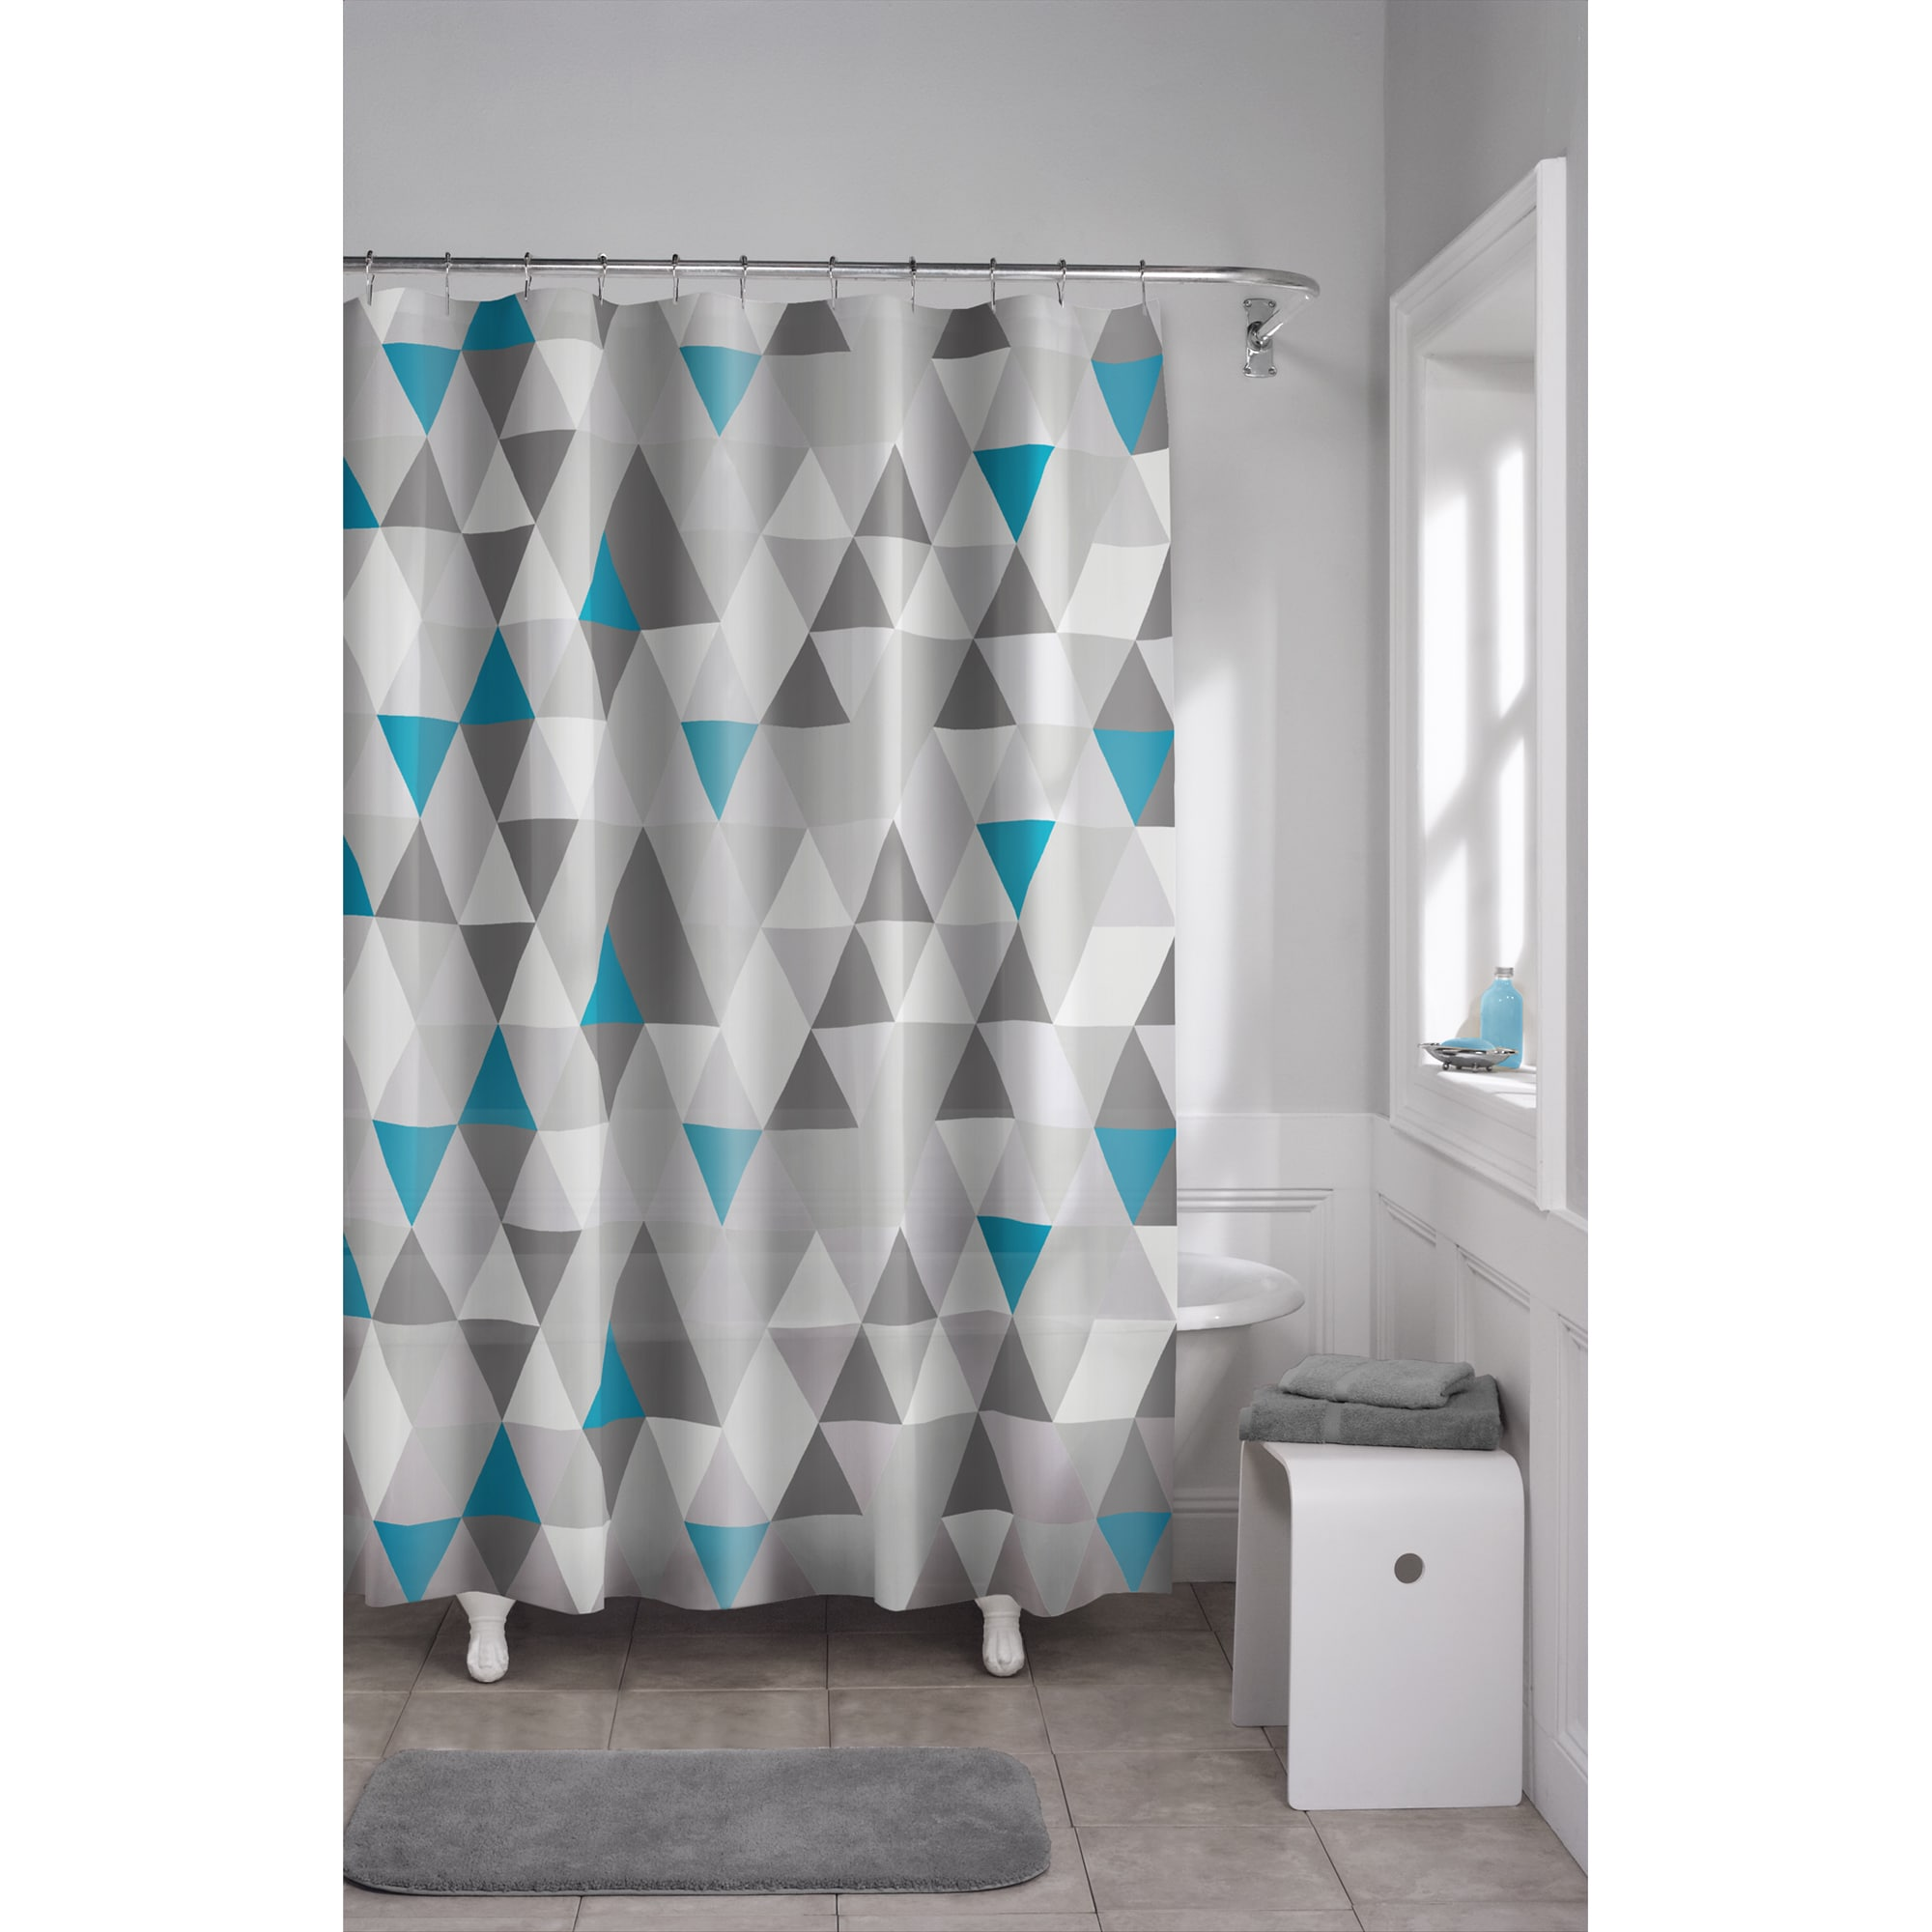 Maytex Vertex PEVA Shower Curtain